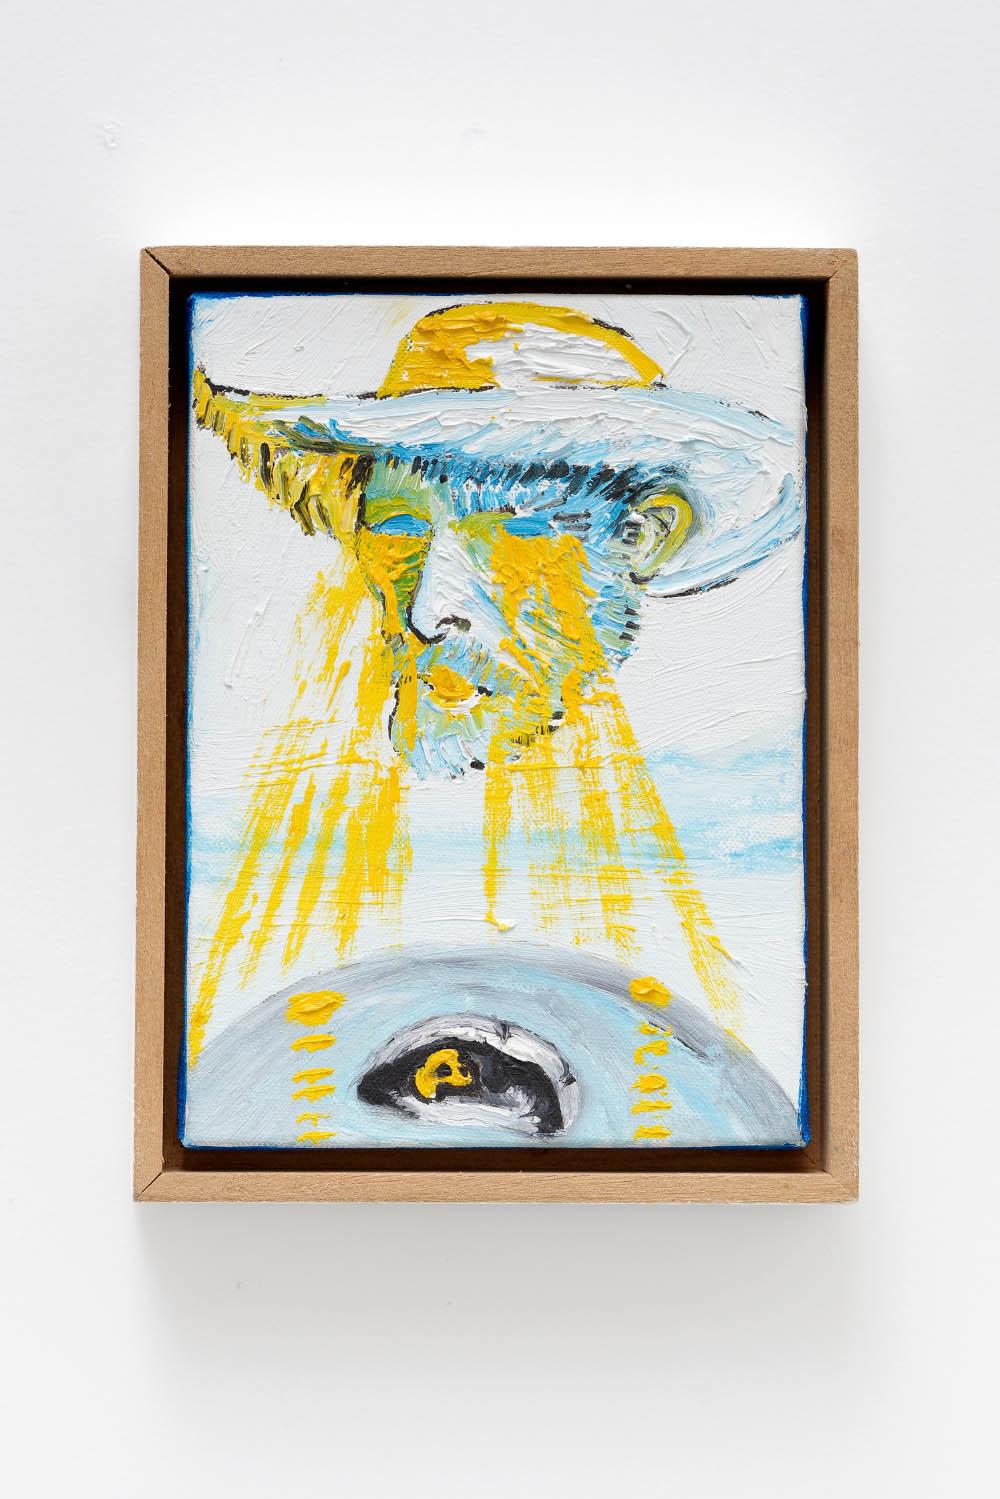 Senza titolo (serie Van Gogh), 2010, Oil on canvas, 14,5 x 10,5 (5 3/4 x 4 1/8 in.)